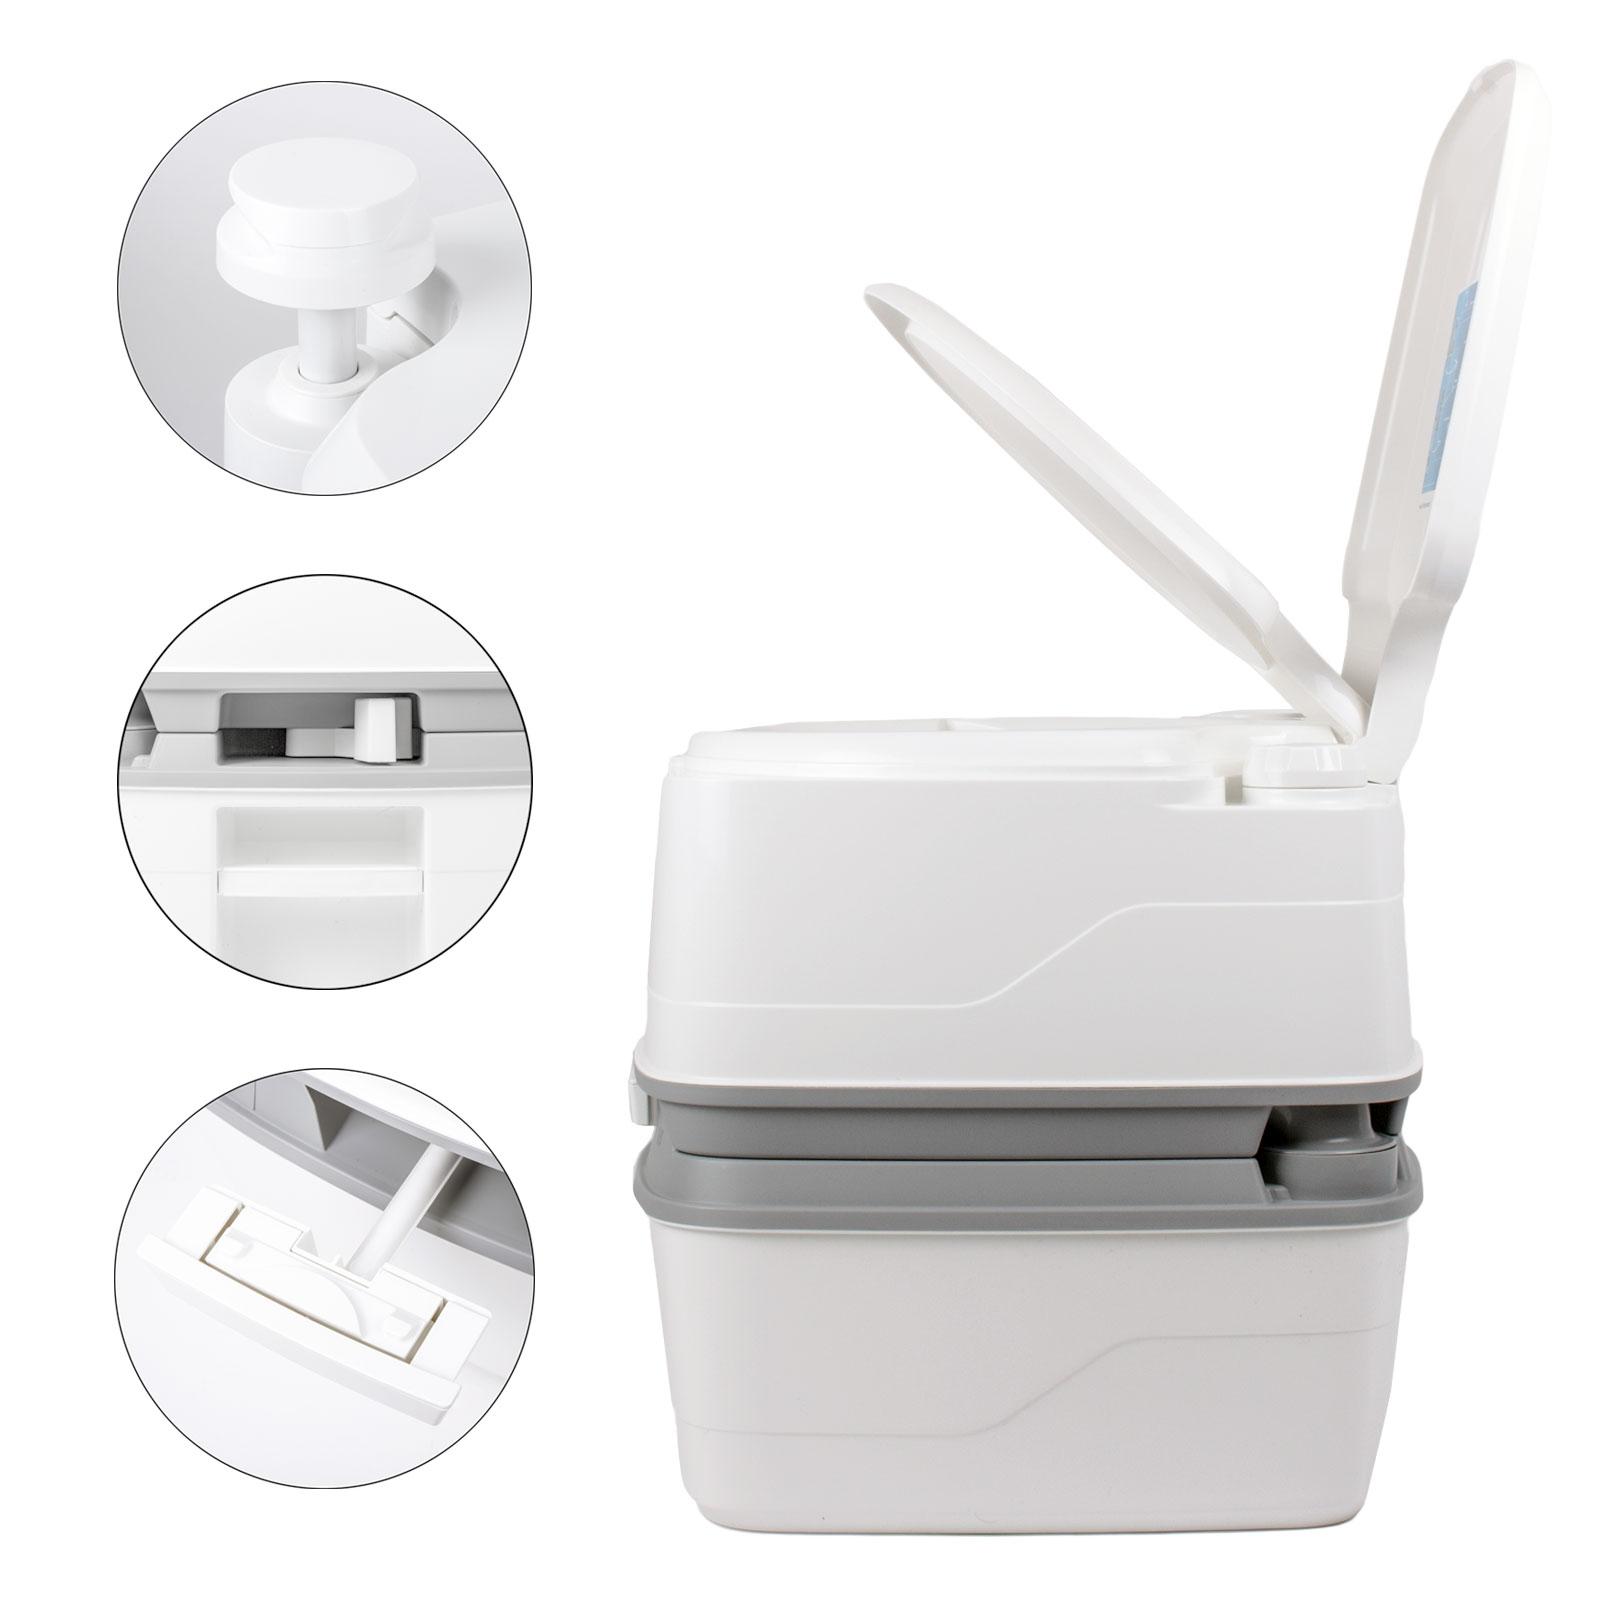 porta potti qube 365 chemie fiamma toilet brush aquasoft for caravans ebay. Black Bedroom Furniture Sets. Home Design Ideas